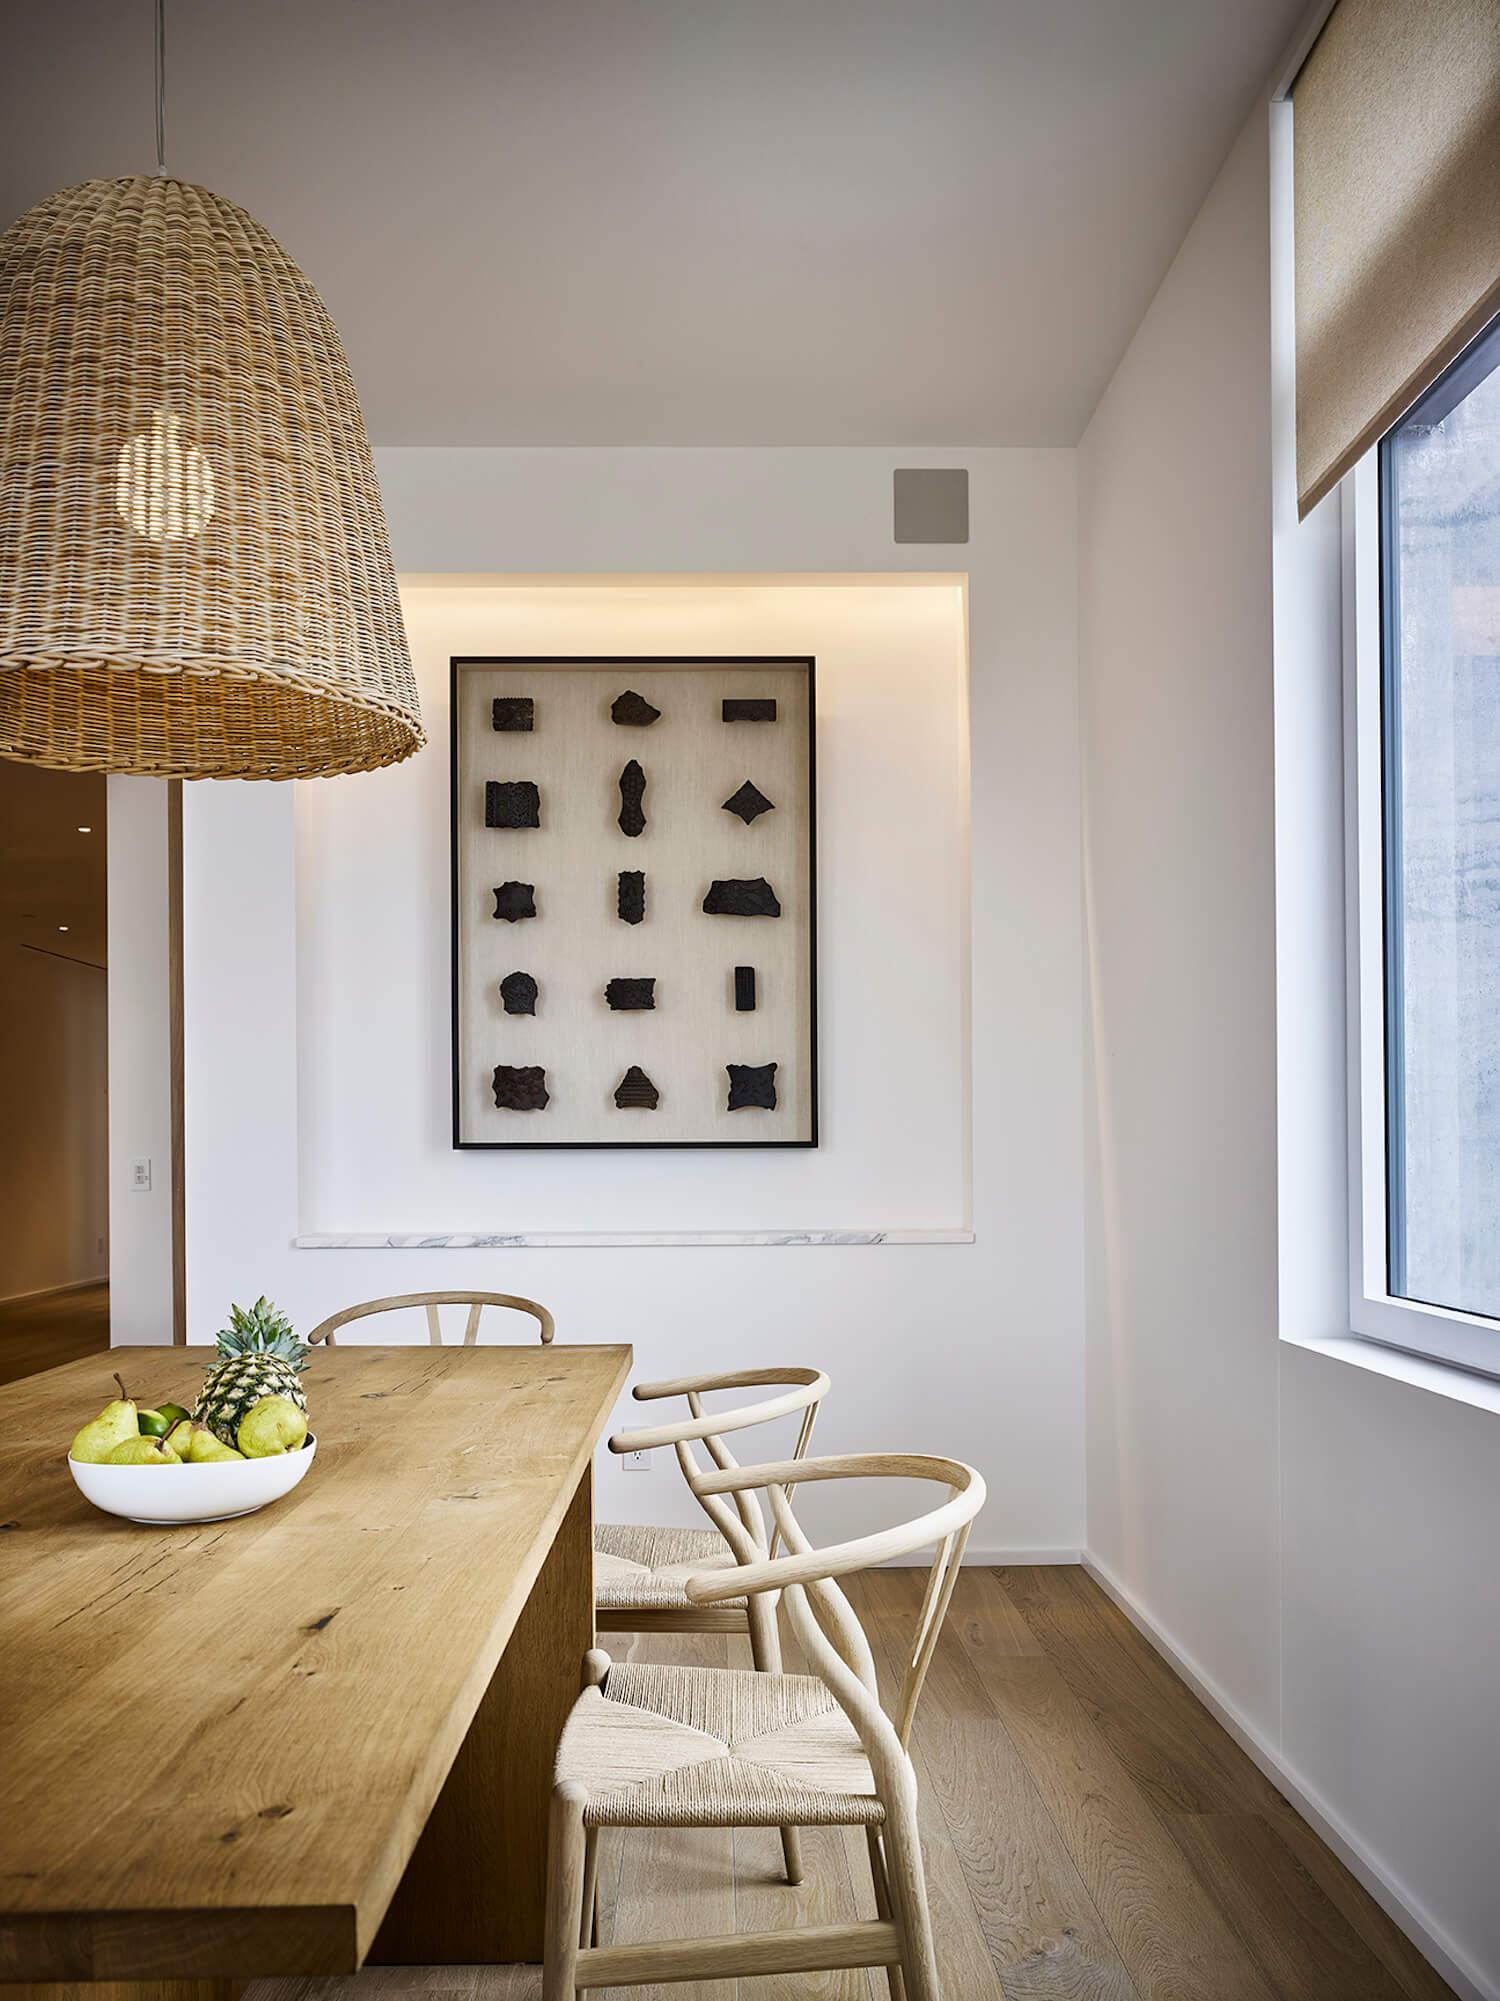 est living global interiors river loft robert young architects RRA 12 LAIGHT F.OUDEMAN 2015 ¬ 05